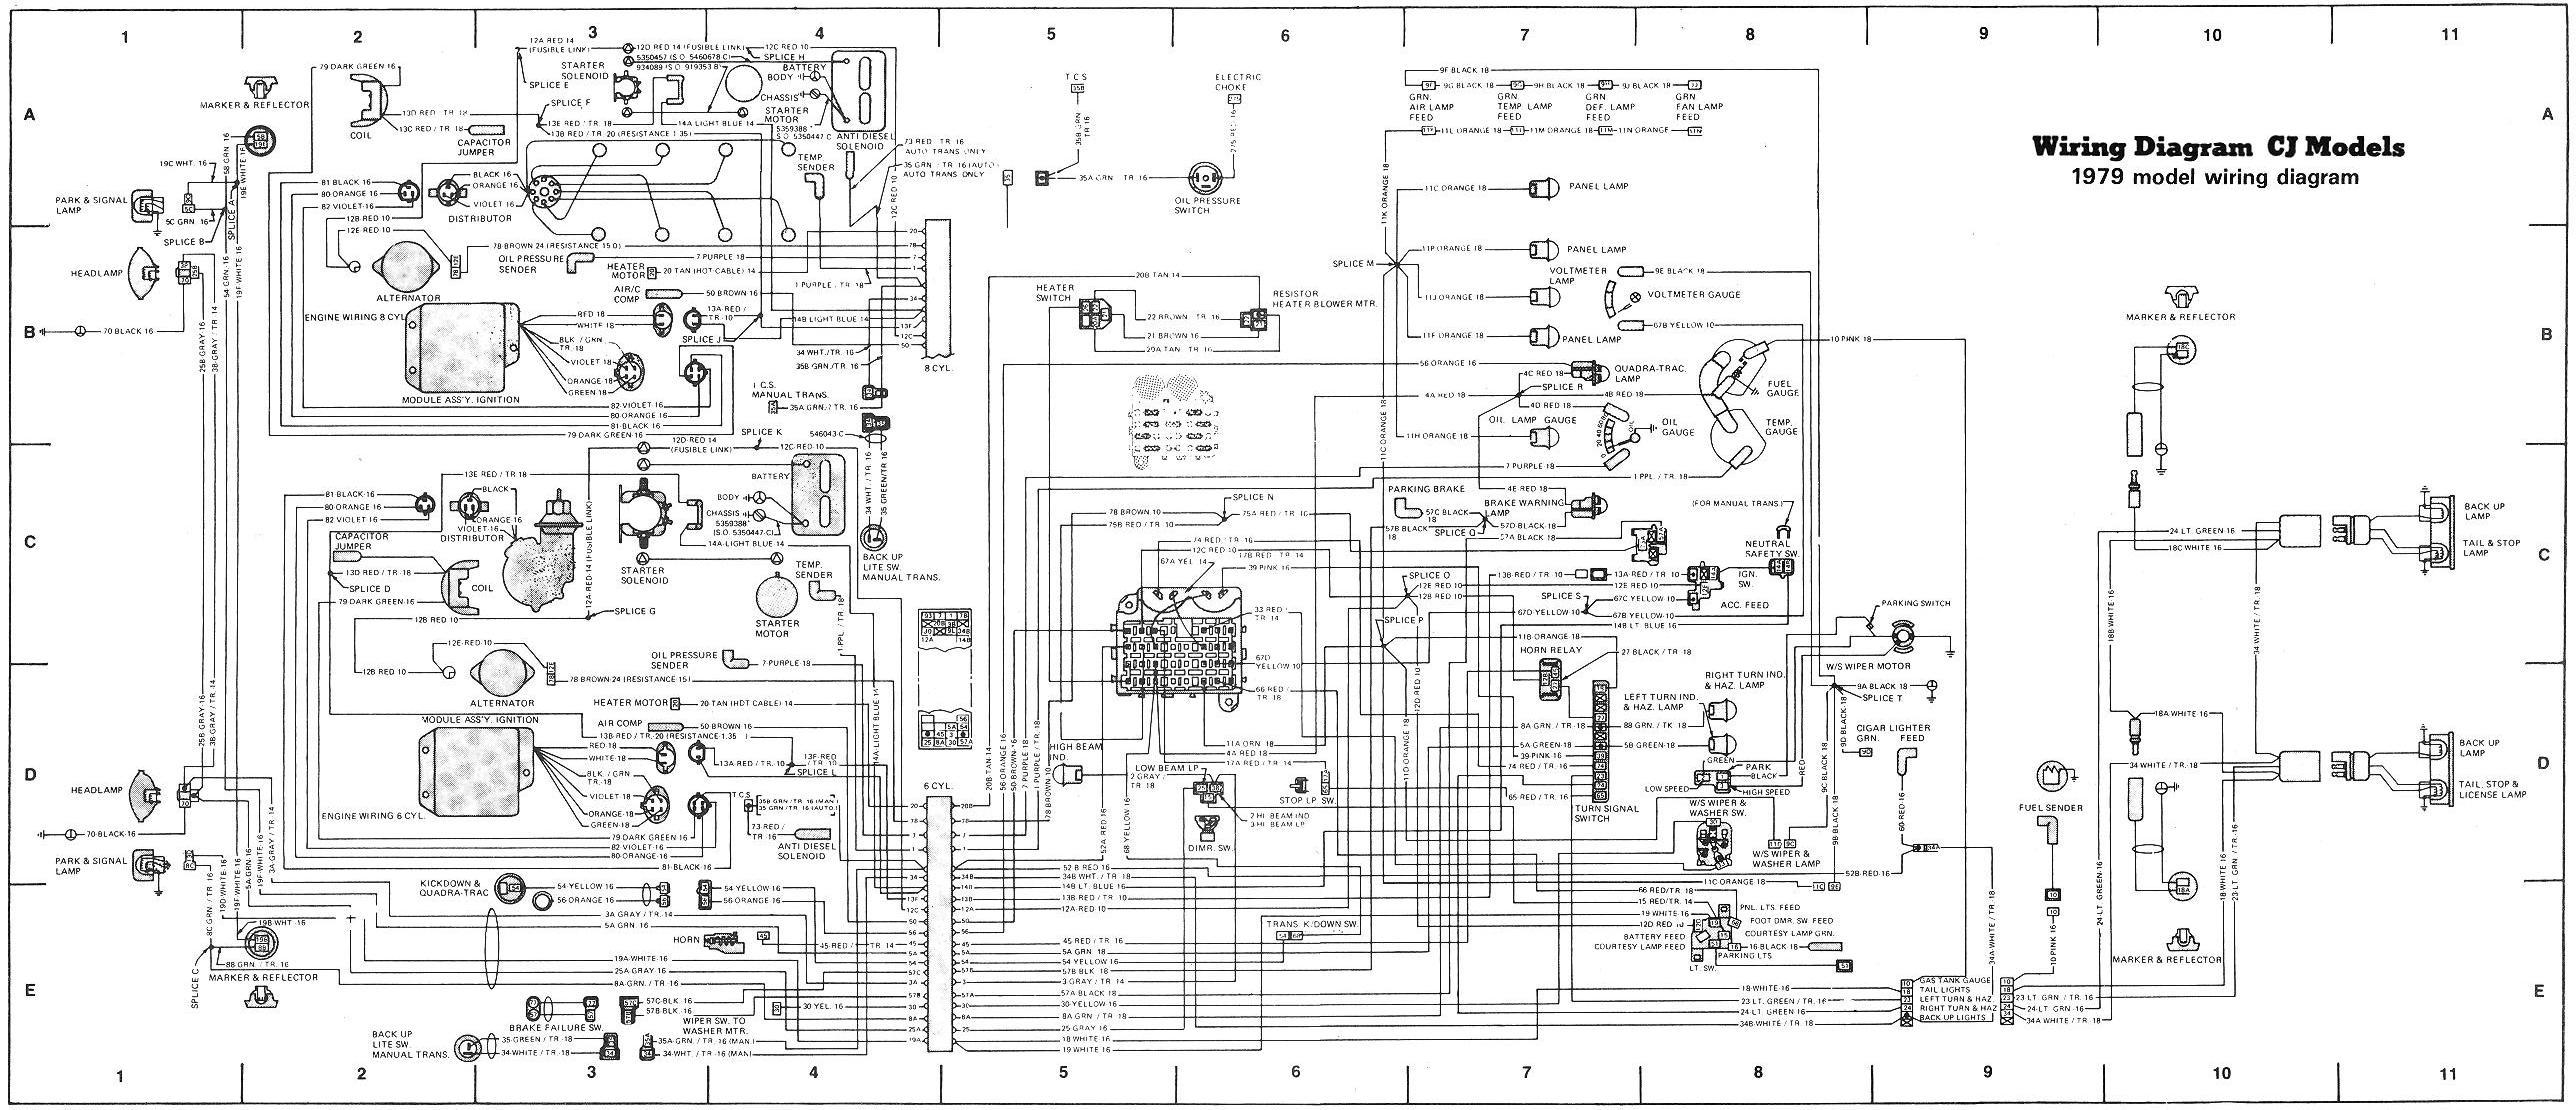 LN_4560] 2001 Kenworth T300 Wiring Diagram Wiring DiagramLotap Hylec Epsy Staix Usnes Ling Props Chim Cular Puti Onica Gue45 Sapebe  Mohammedshrine Librar Wiring 101